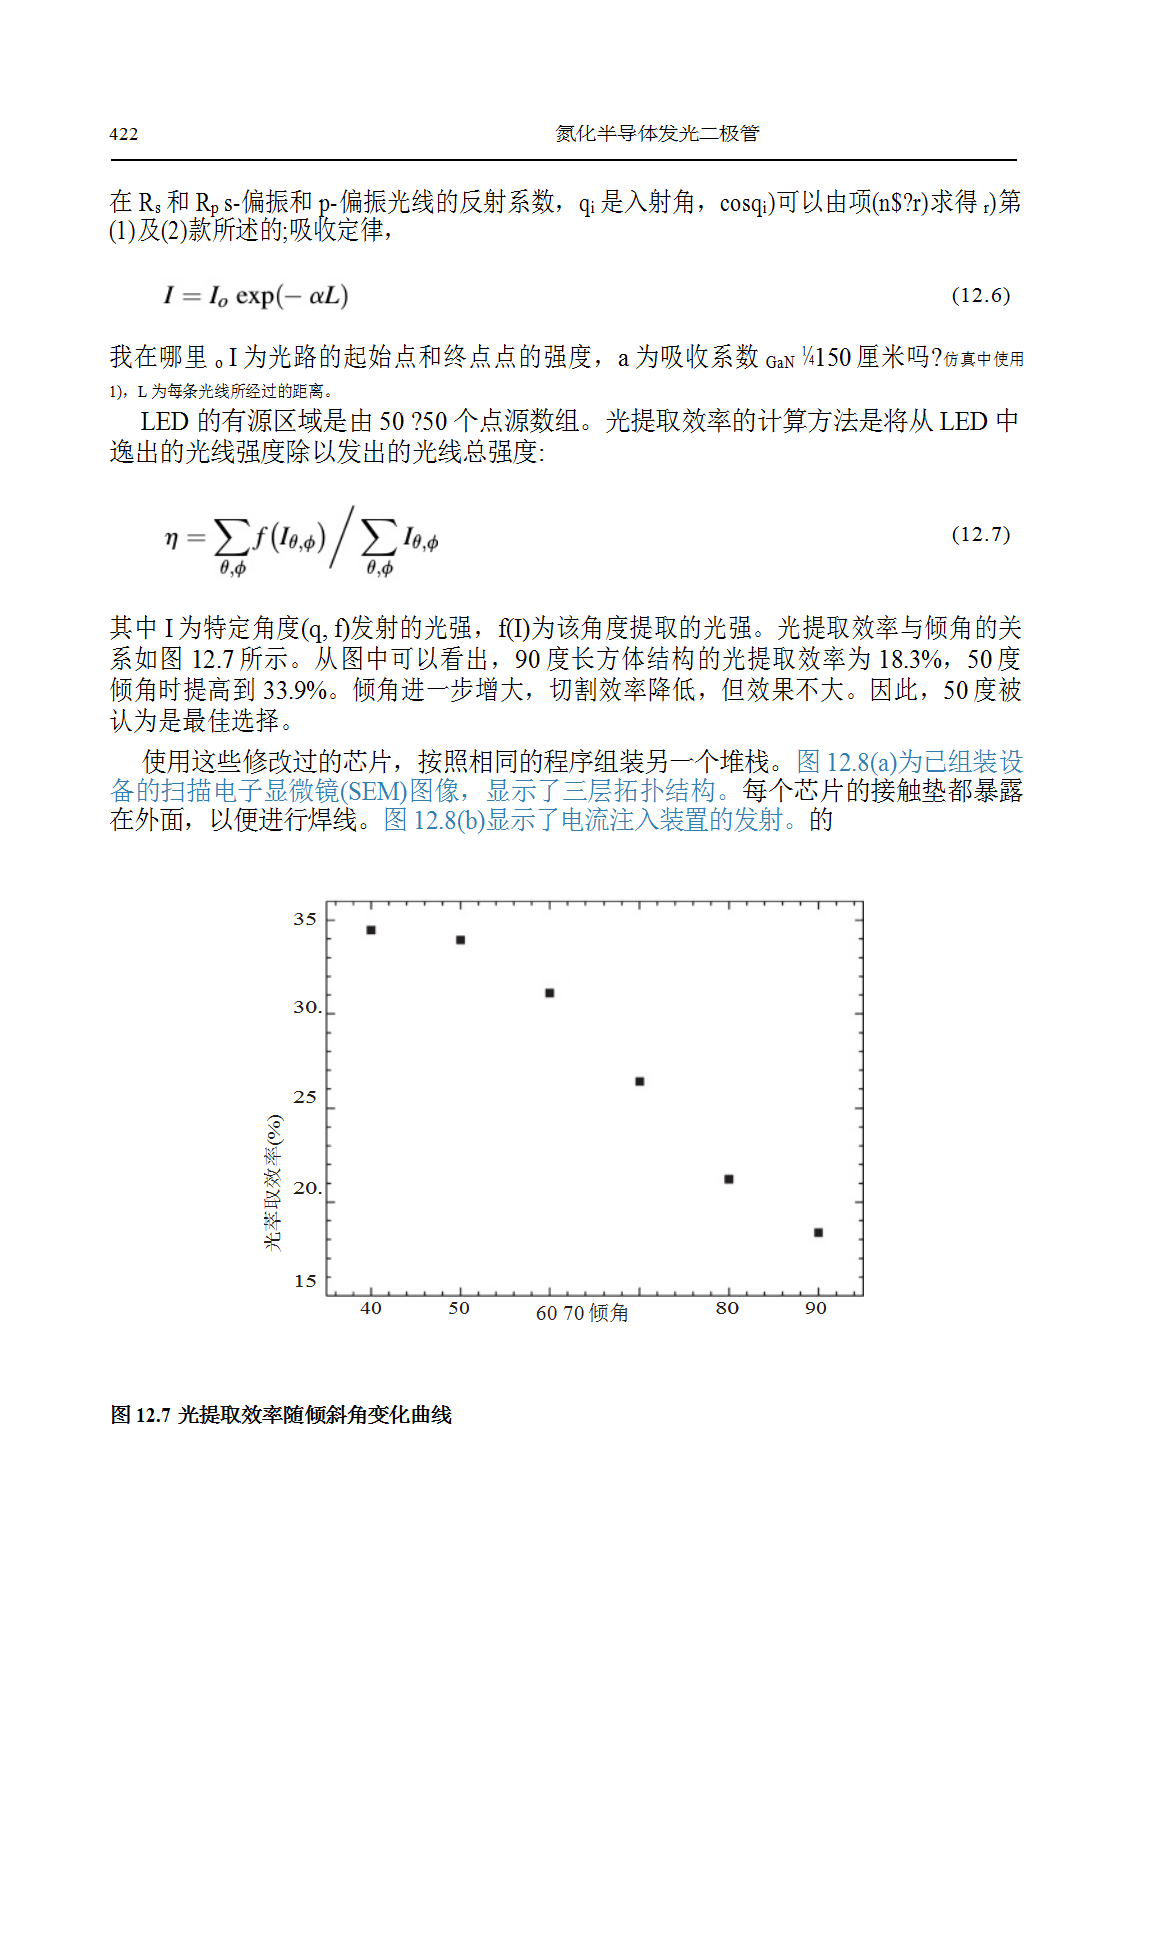 LED调色和像素化MicroLED阵列研究  第8张